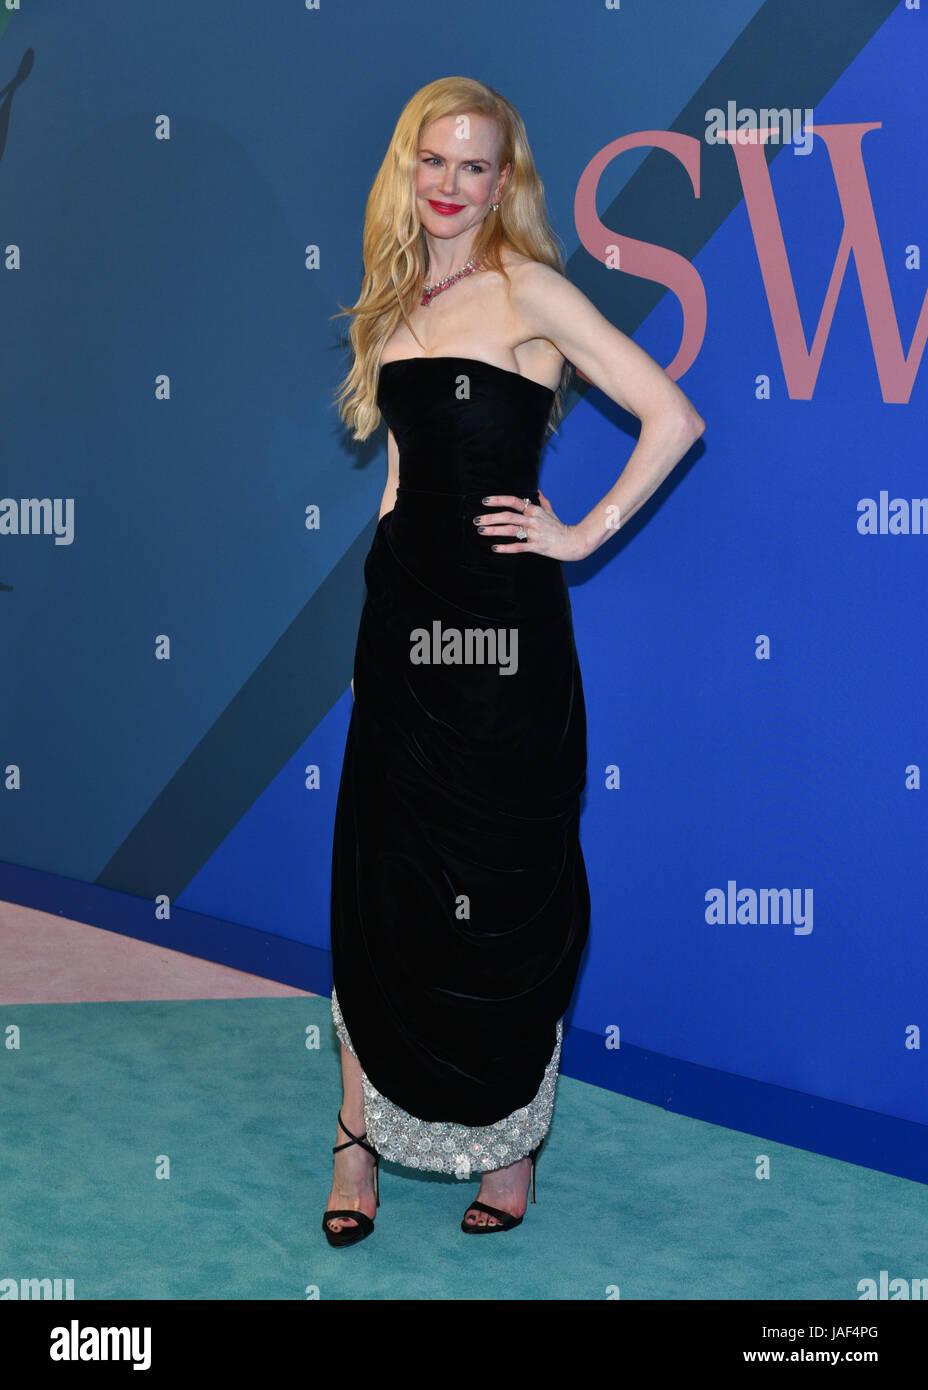 New York, USA. 5th Jun, 2017. Nicole Kidman attends the 2017 CFDA Fashion Awards at Hammerstein Ballroom on June - Stock Image